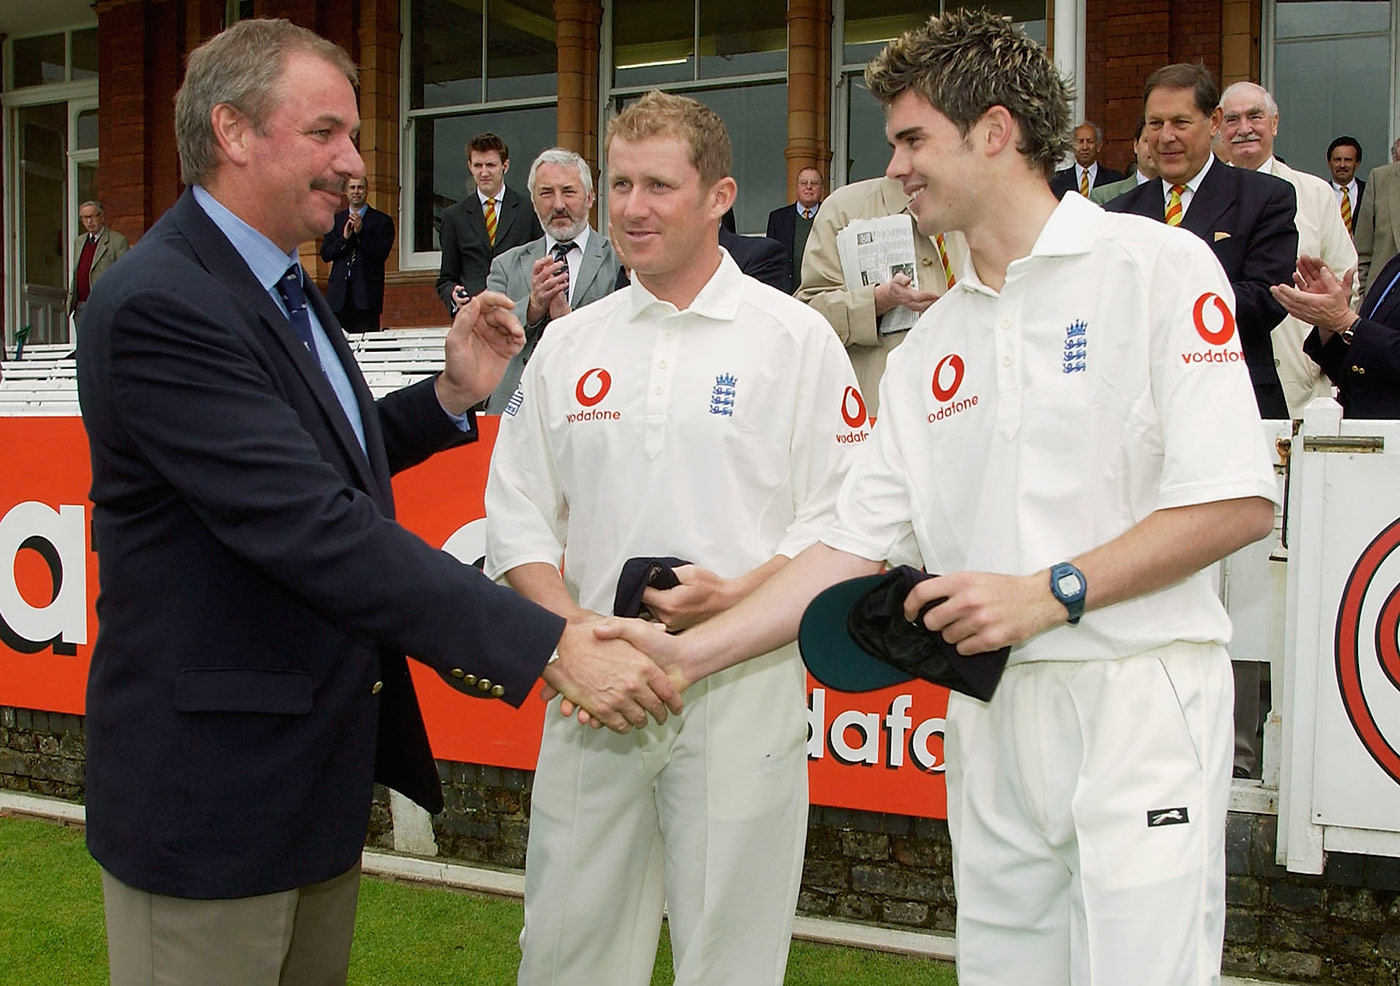 James Anderson receives his England cap from David Graveney